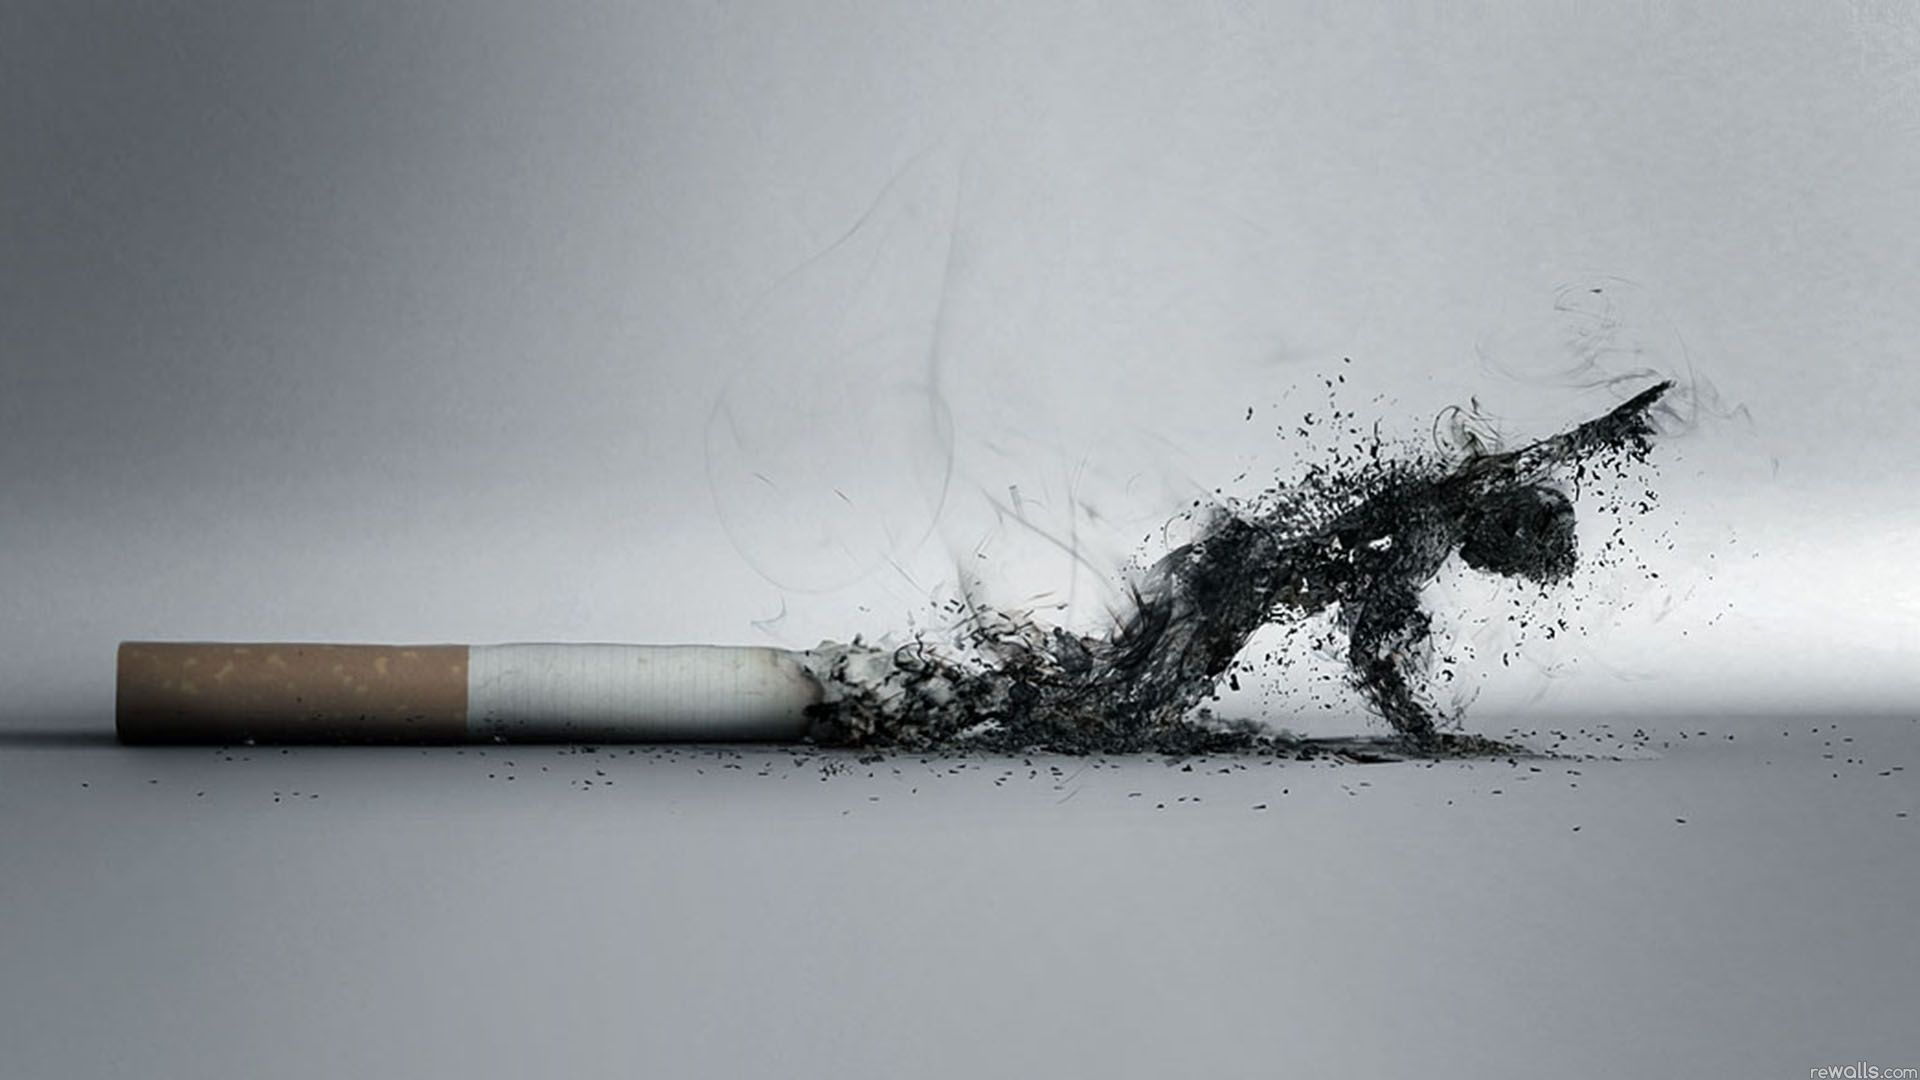 Smoking Kills Half a Million Americans a Year - Partnership for ...